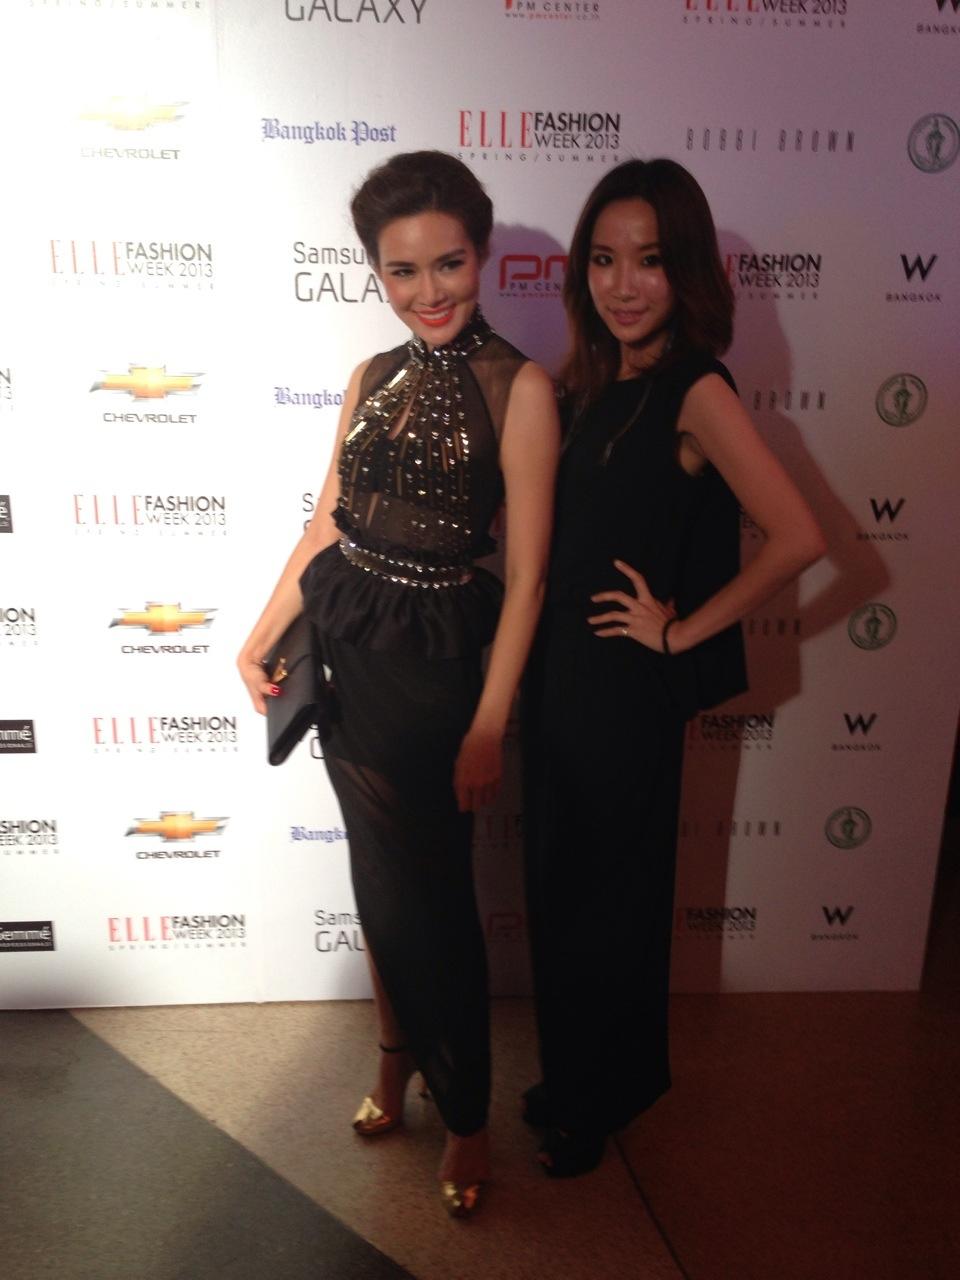 ELLE's Fashion Week-Spring-Summer 2013-The Model Society International Modeling Agency Bangkok Thailand (60)